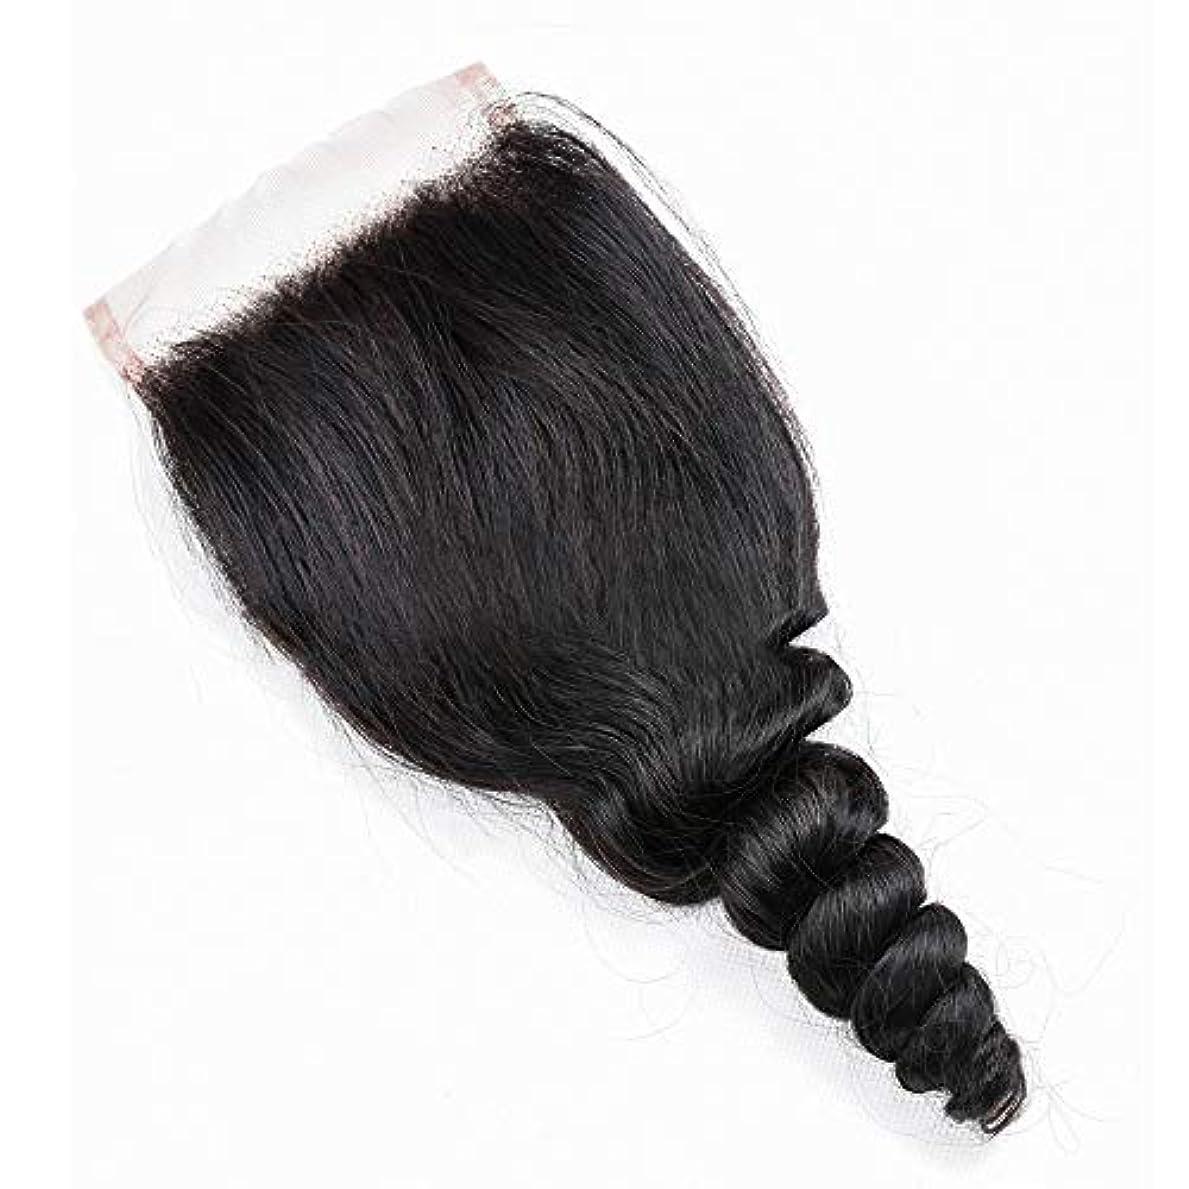 WASAIO レース閉鎖緩い波ブラジルバージン人間の髪の毛 (色 : 黒, サイズ : 14 inch)